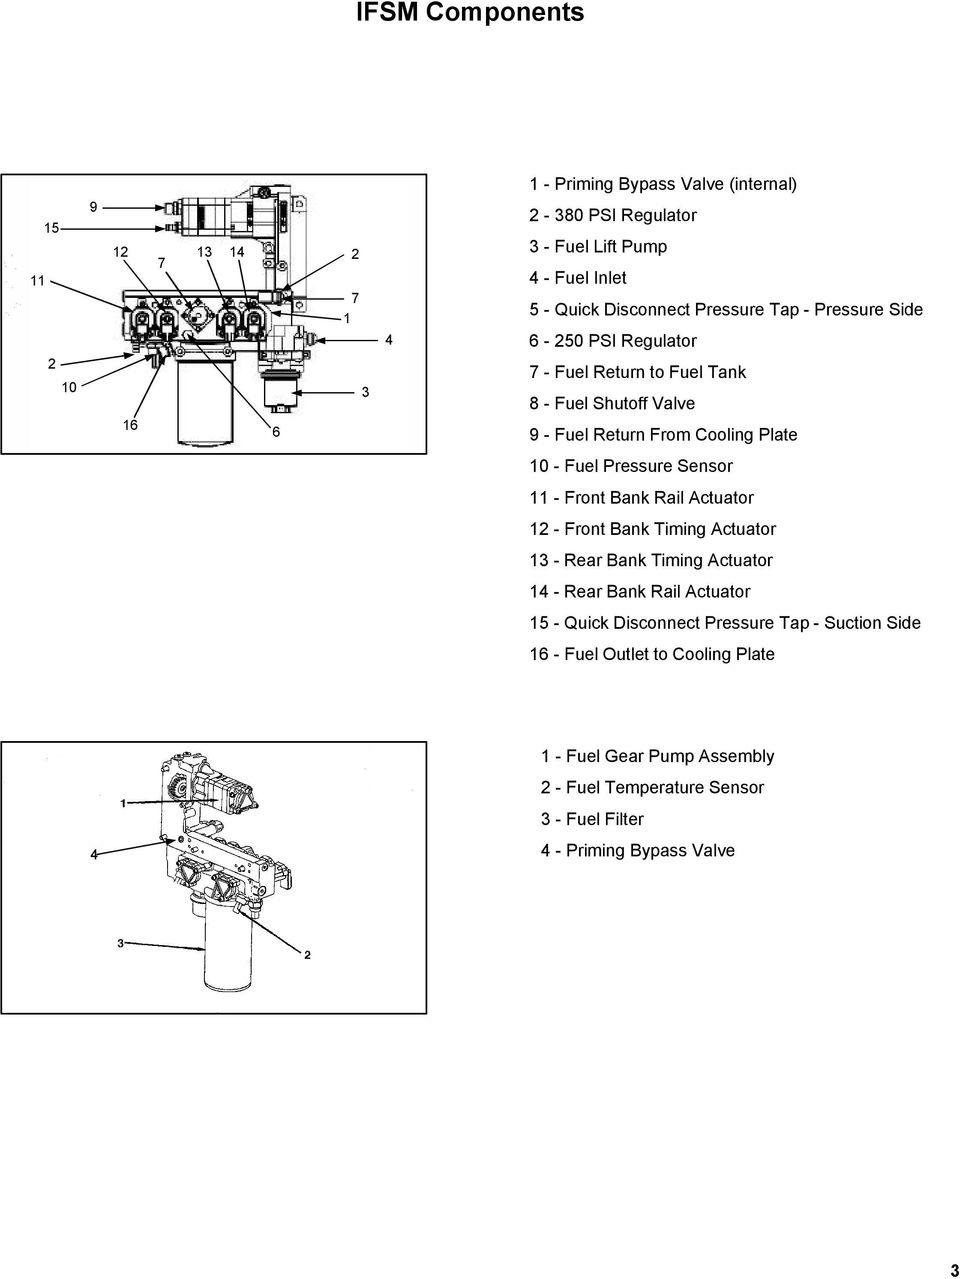 Cummins Isx Fuel Pump Diagram : cummins, diagram, Cummins, Valve, Diagram, Atkinsjewelry